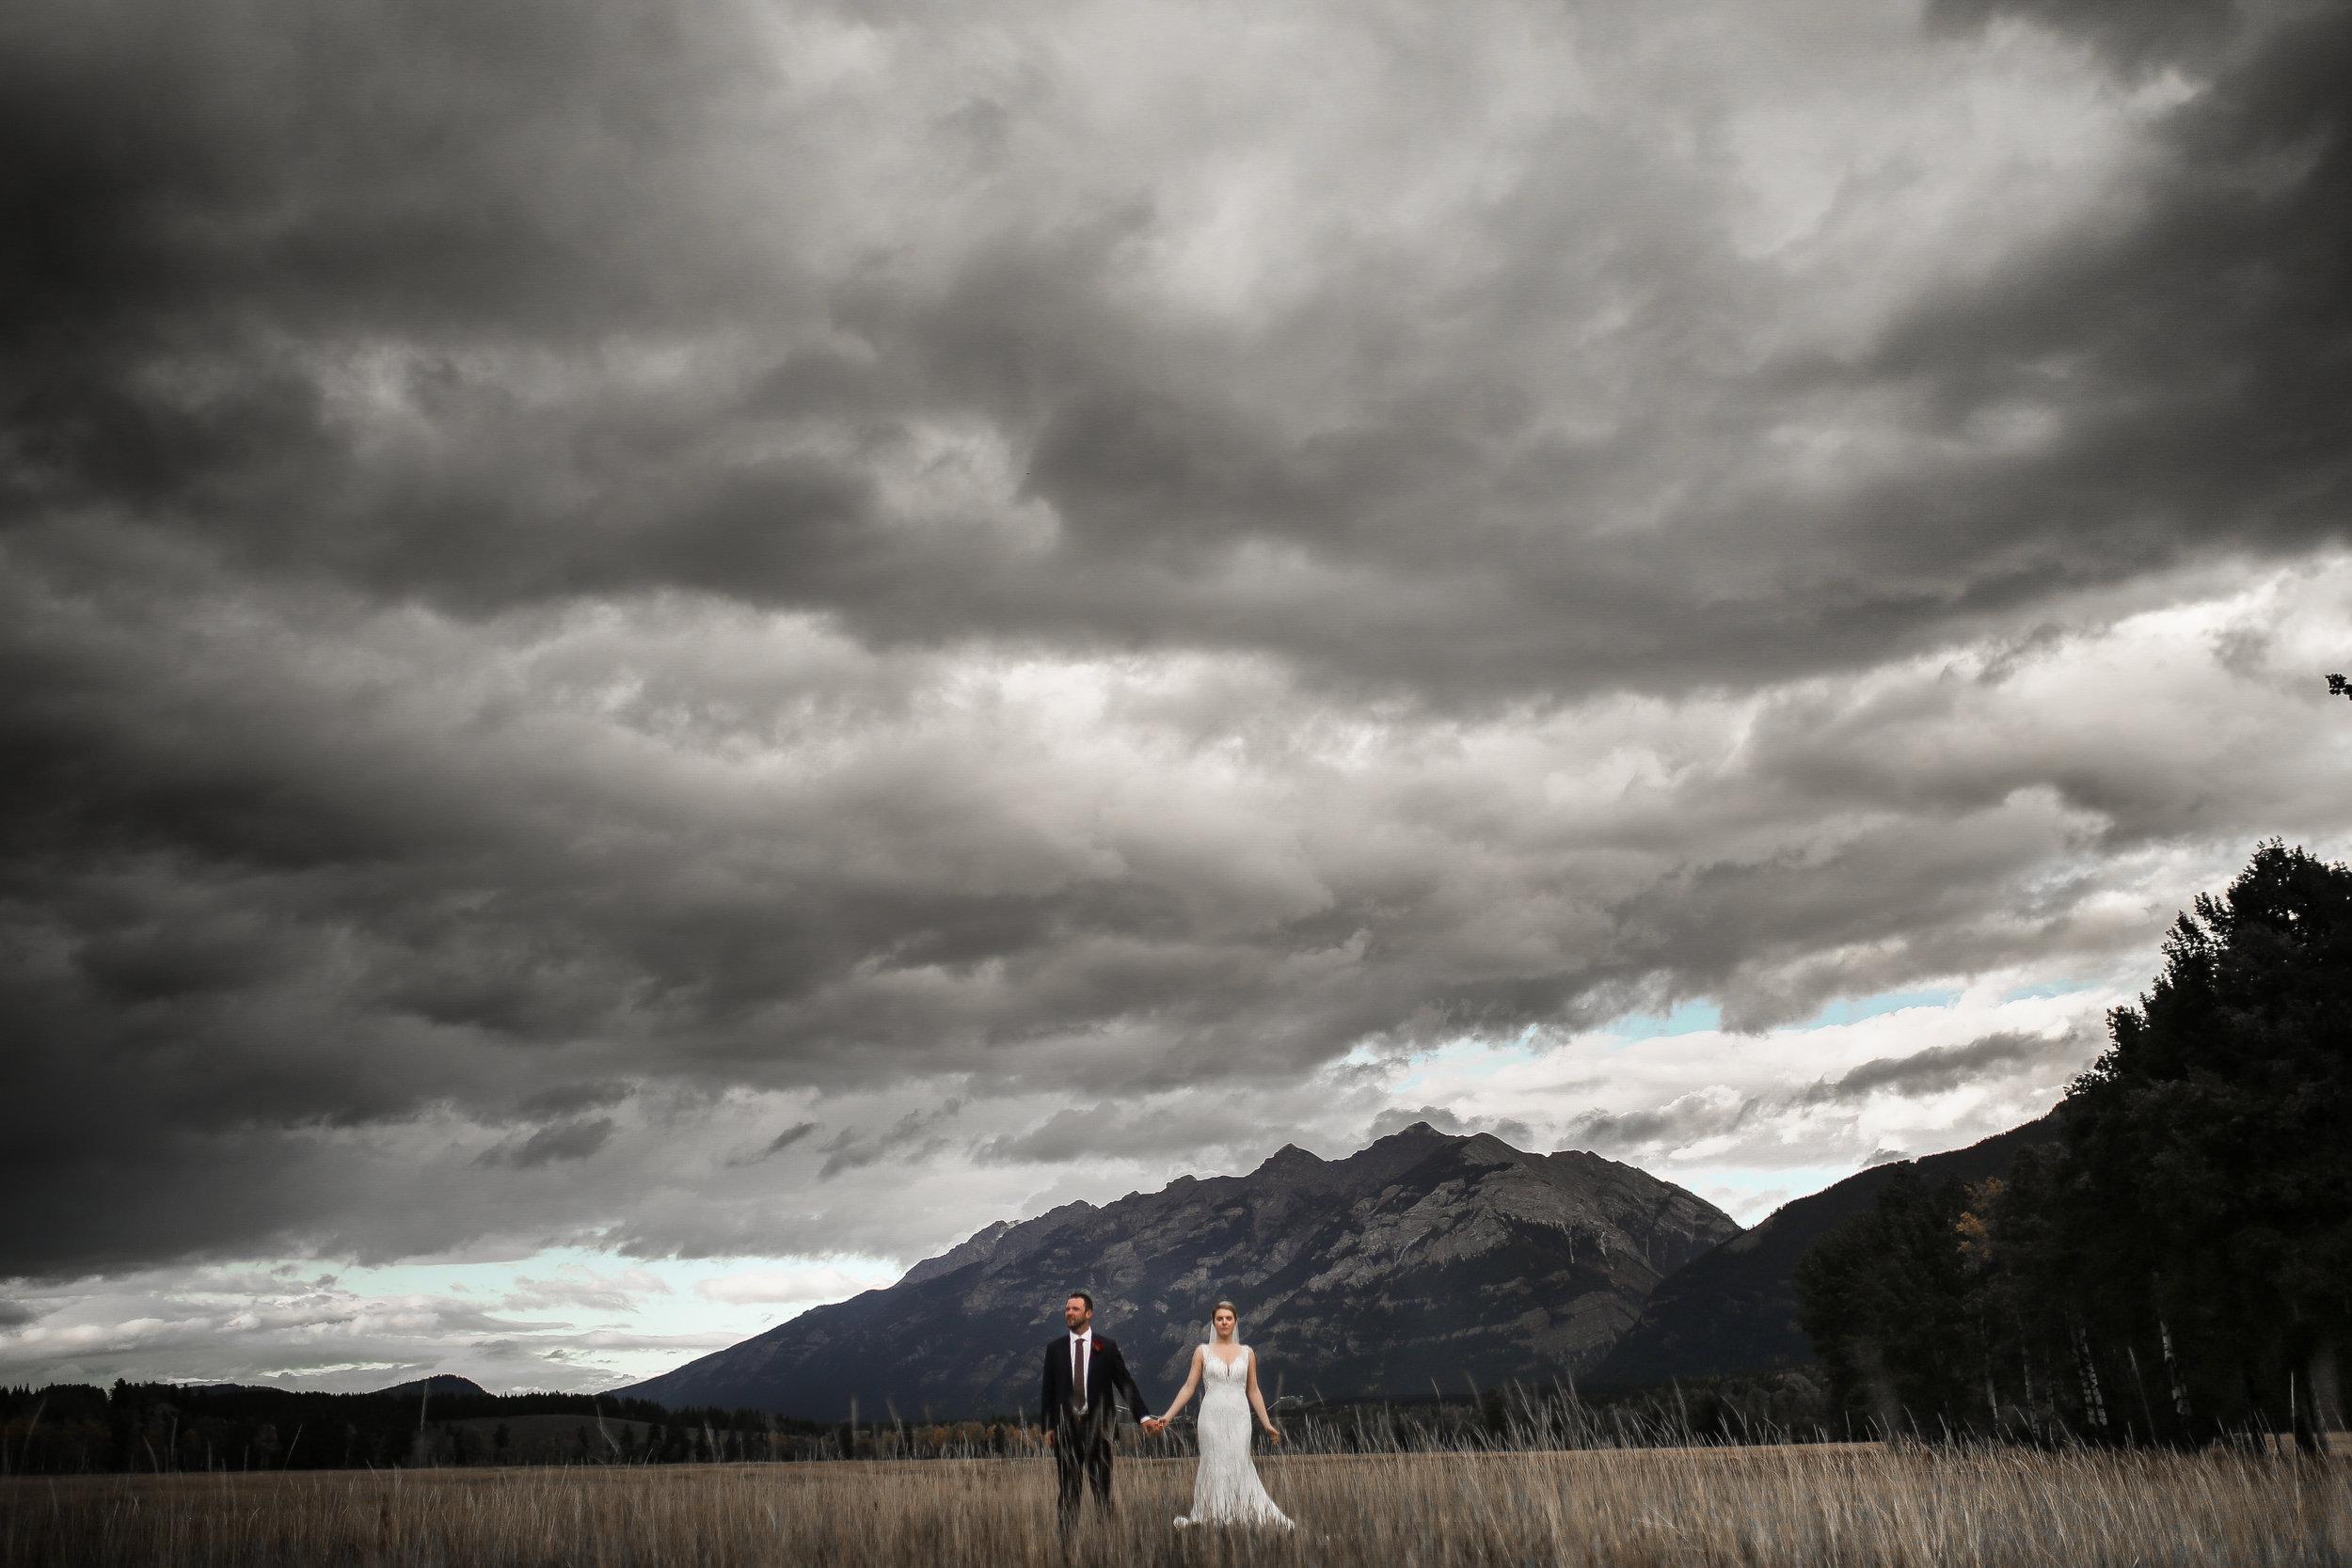 35 Adam Ziorio Photography - Vitoria wedding photographer Nick&Bree Fernie Wedding.jpg